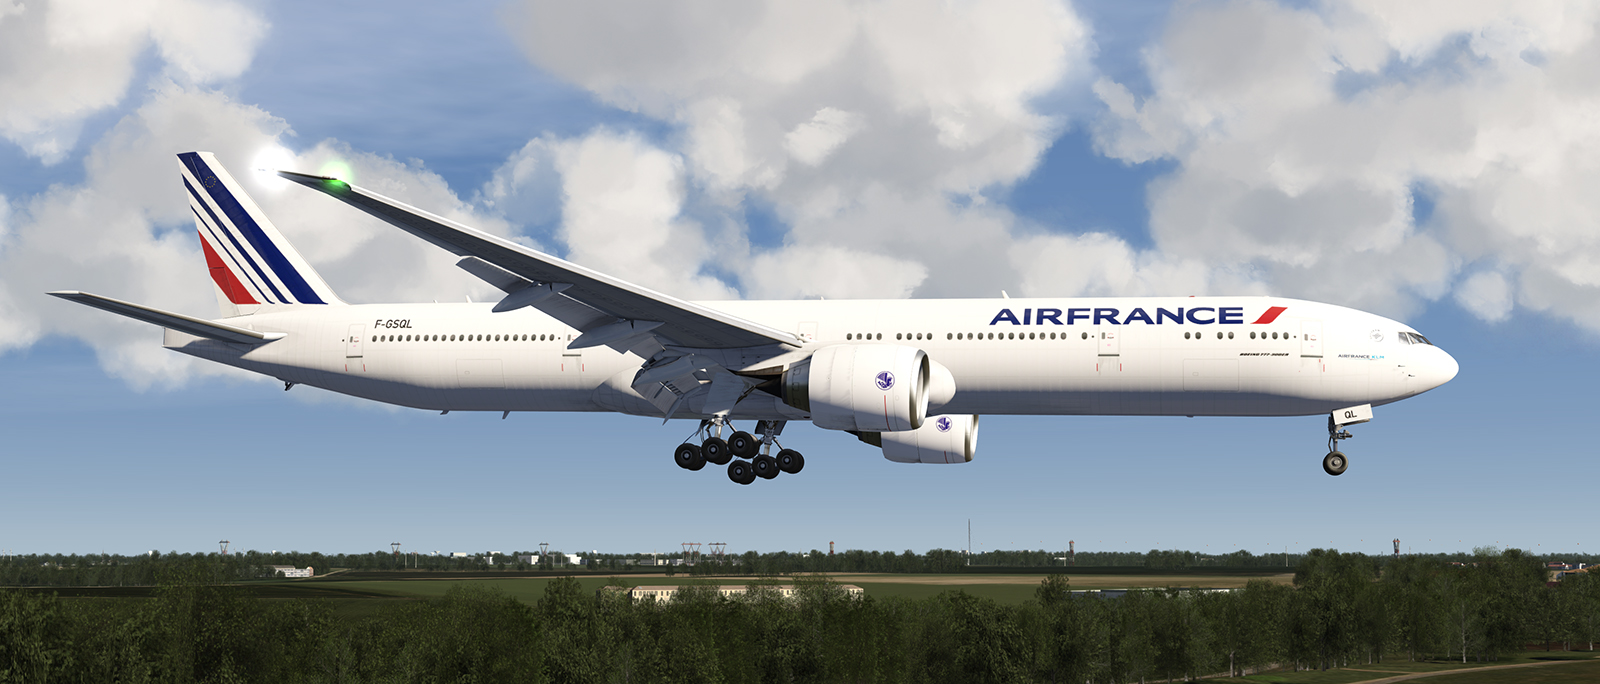 aerofly_fs_2_screenshot_25_20200201-0021